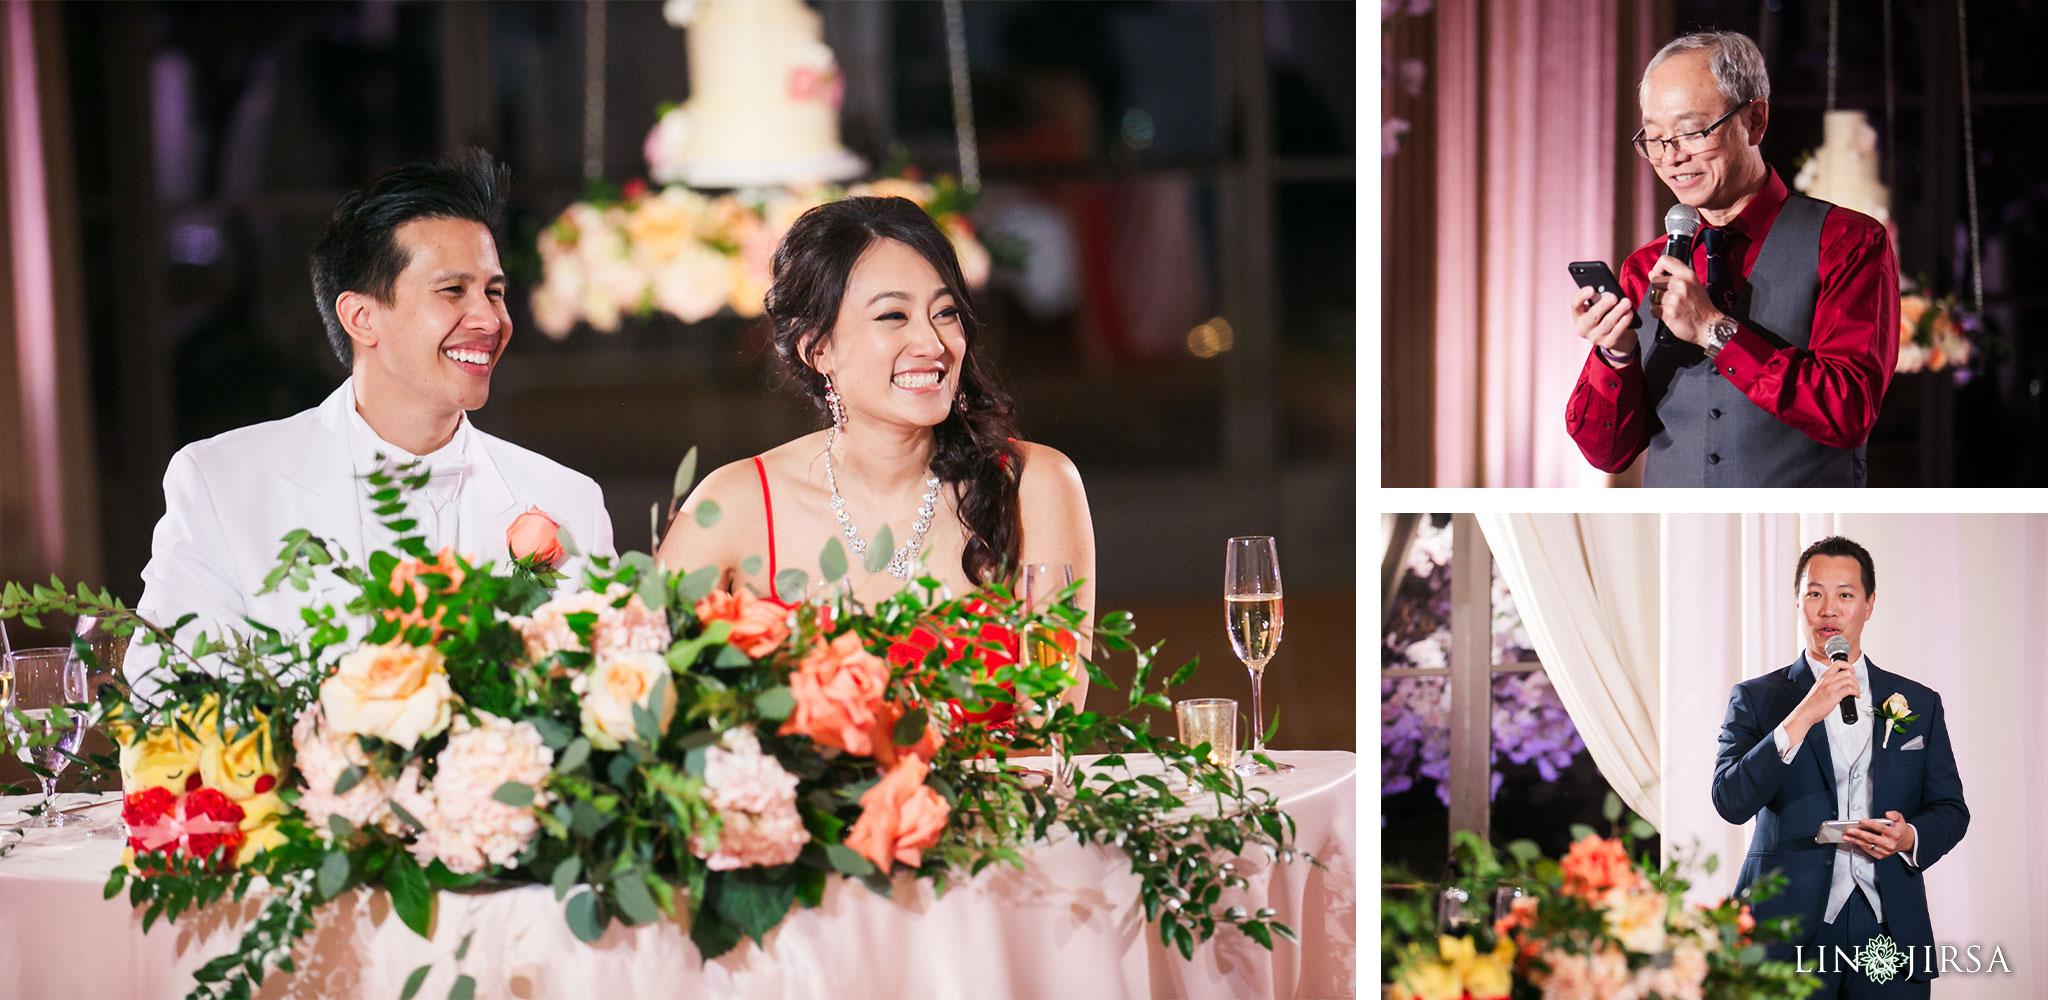 35 Pelican Hill Resort Orange County Wedding Photography